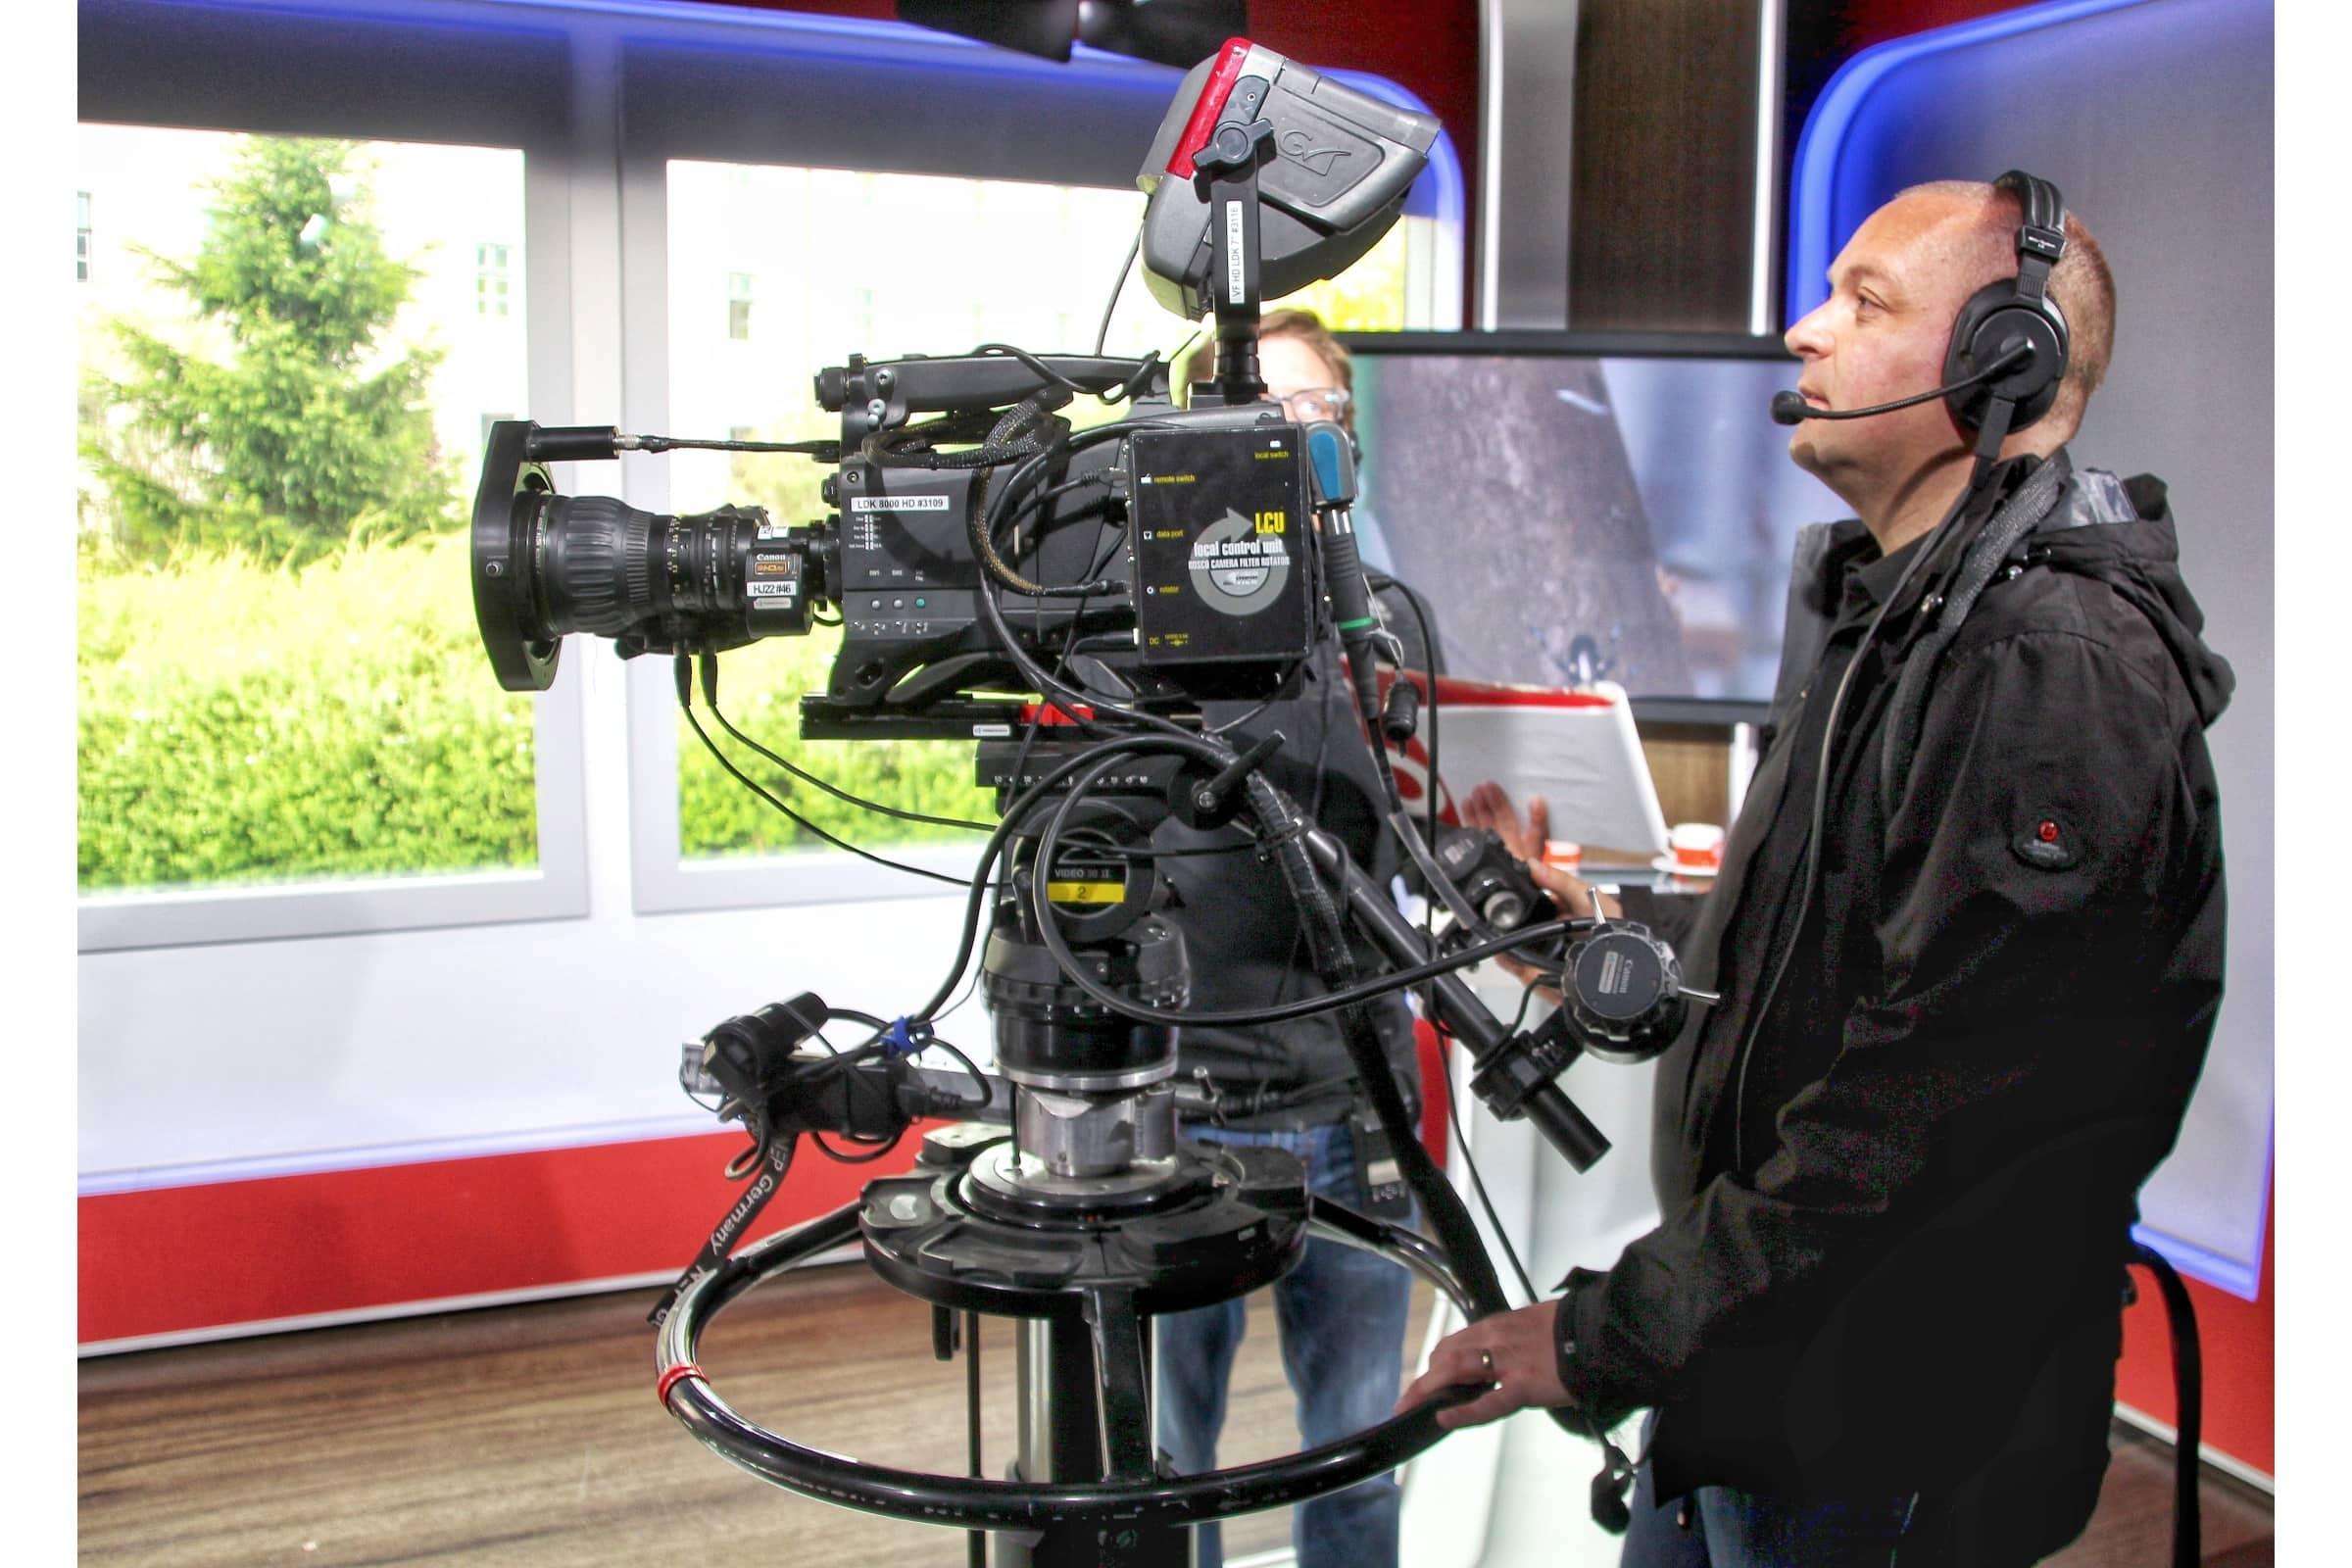 andreas felder kameramann orf unterwegs in österreich 24 02.05.2018 09 21 39 - ORF Unterwegs in Österreich - Tirol